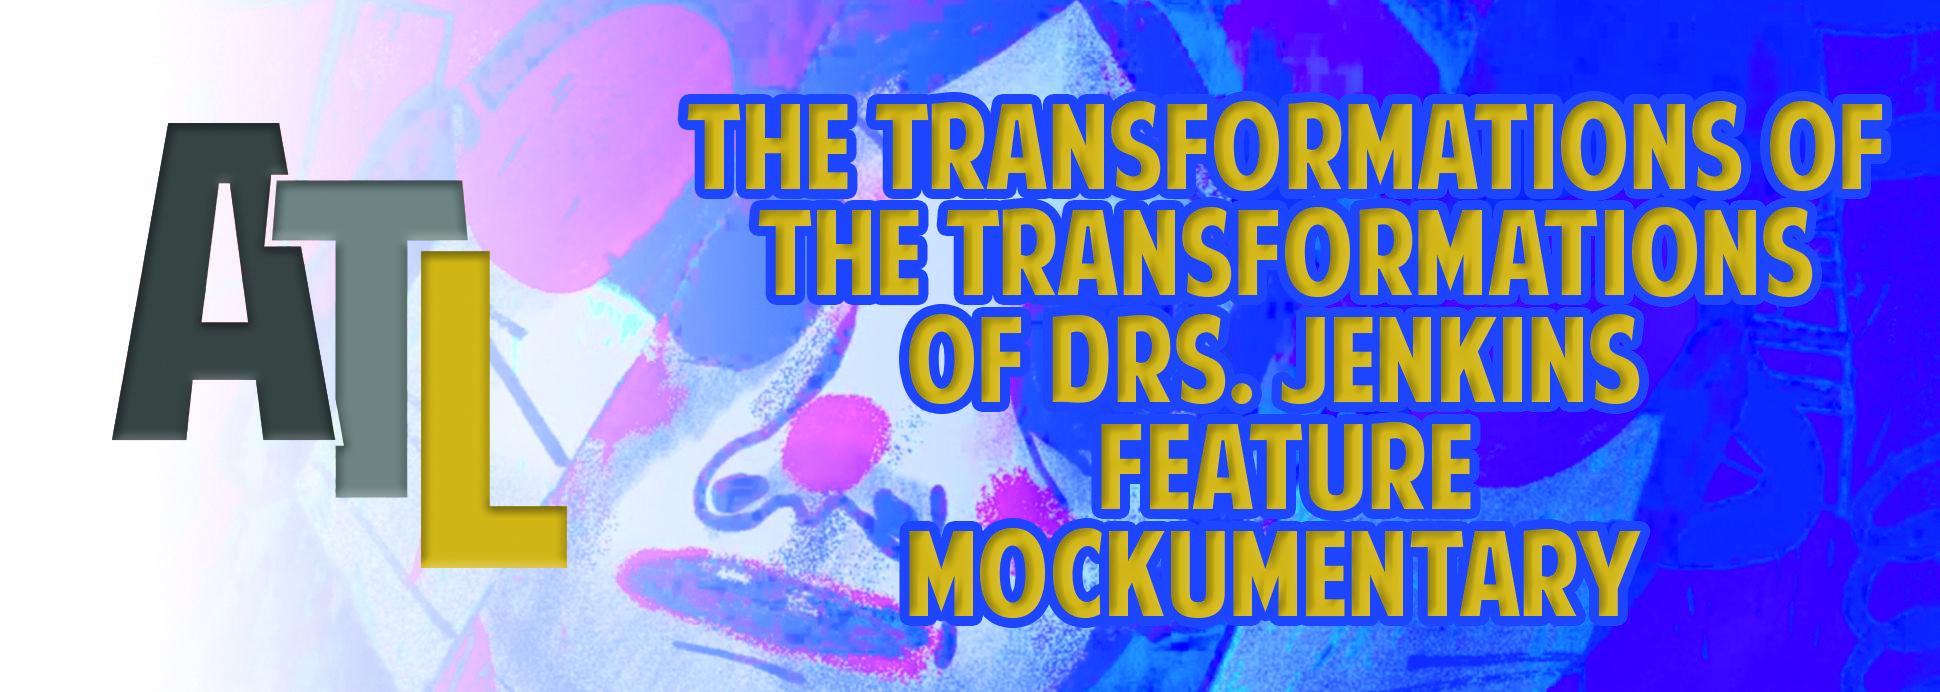 The Transformations of the Transformations of Drs. Jenkins